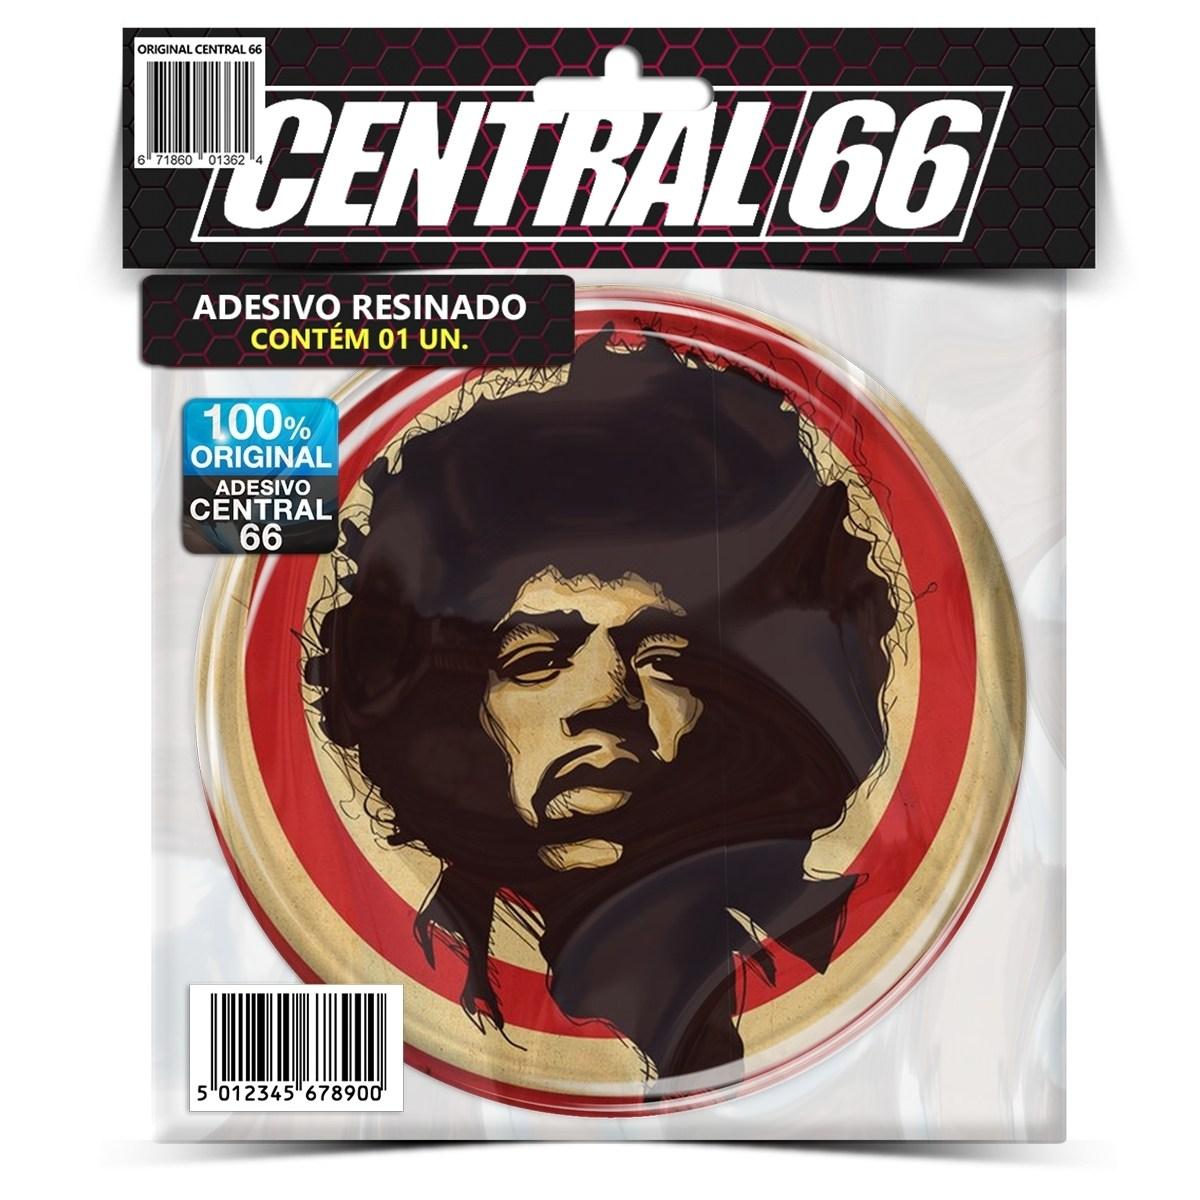 Adesivo Redondo Jimi Hendrix – Central 66